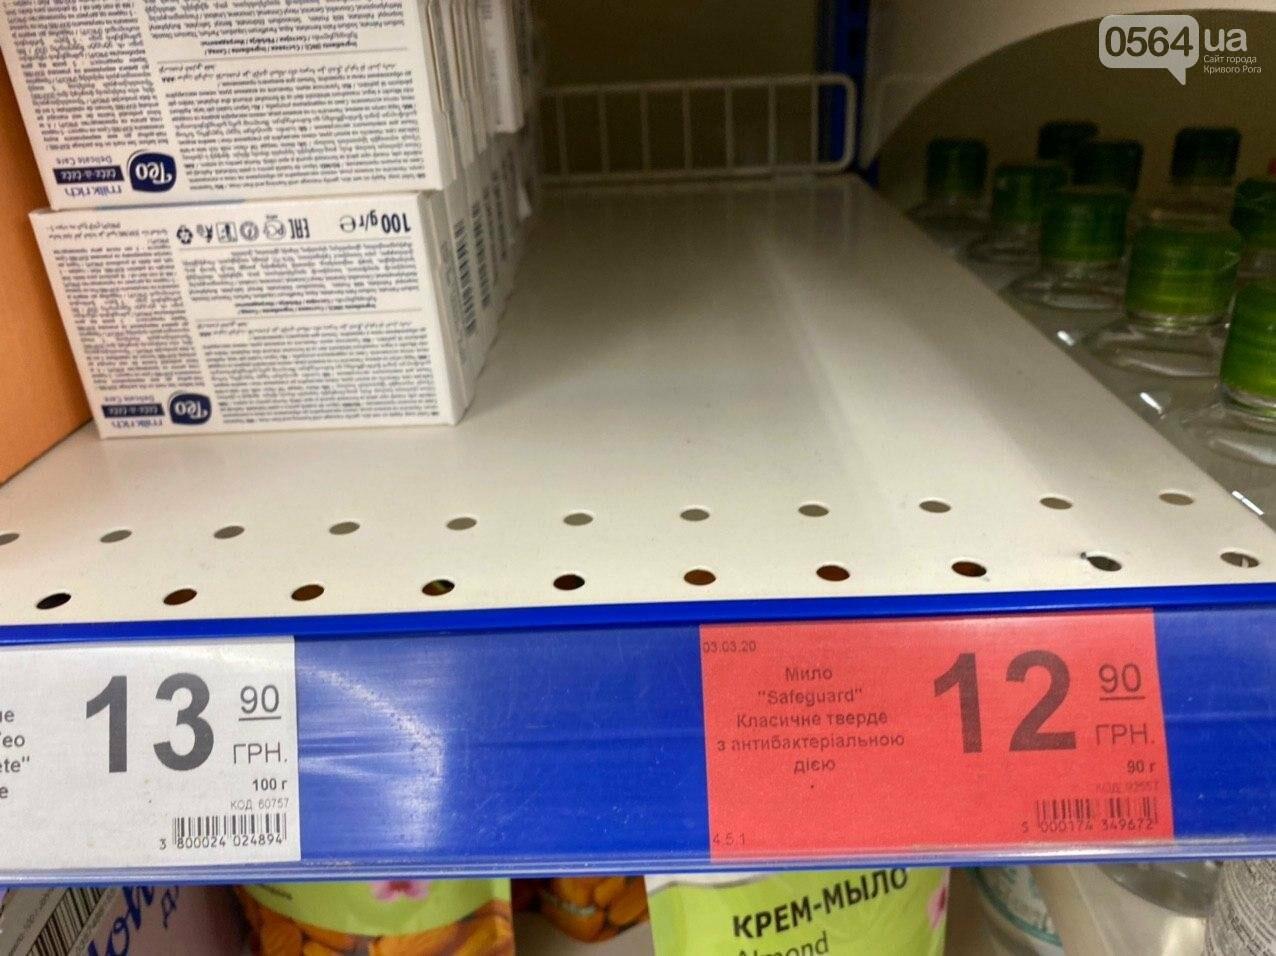 Туалетная бумага и гречка: что скупают криворожане во время карантина, - ФОТО , фото-2